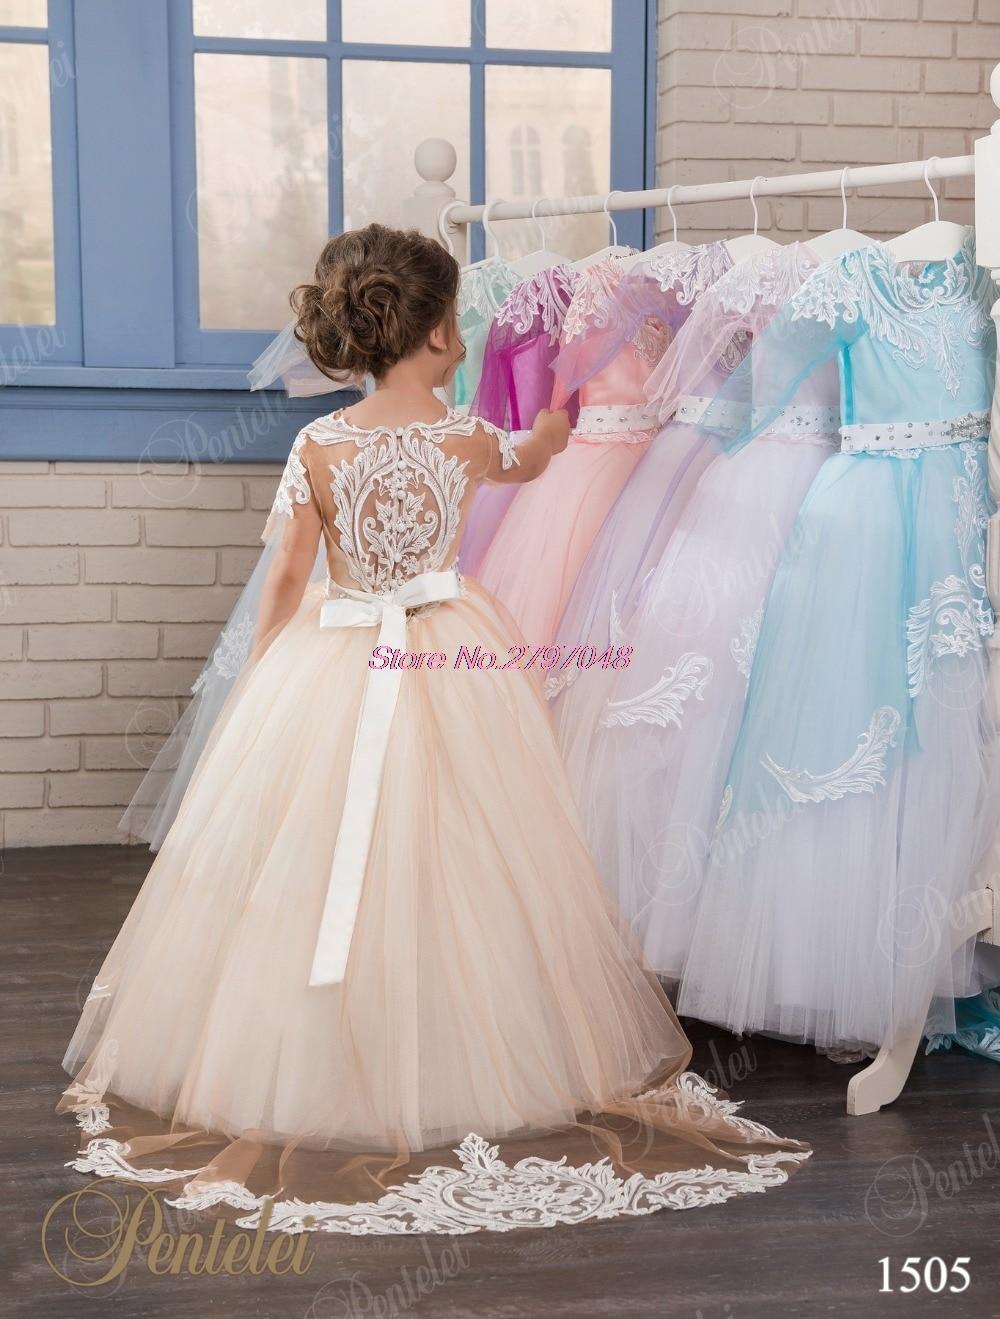 694415a40 Glamorous Lace Appliques Short Sleeves Flower Girl Dresses Beaded communion  dresses Lovely champagne Girls dress F241-in Flower Girl Dresses from  Weddings ...